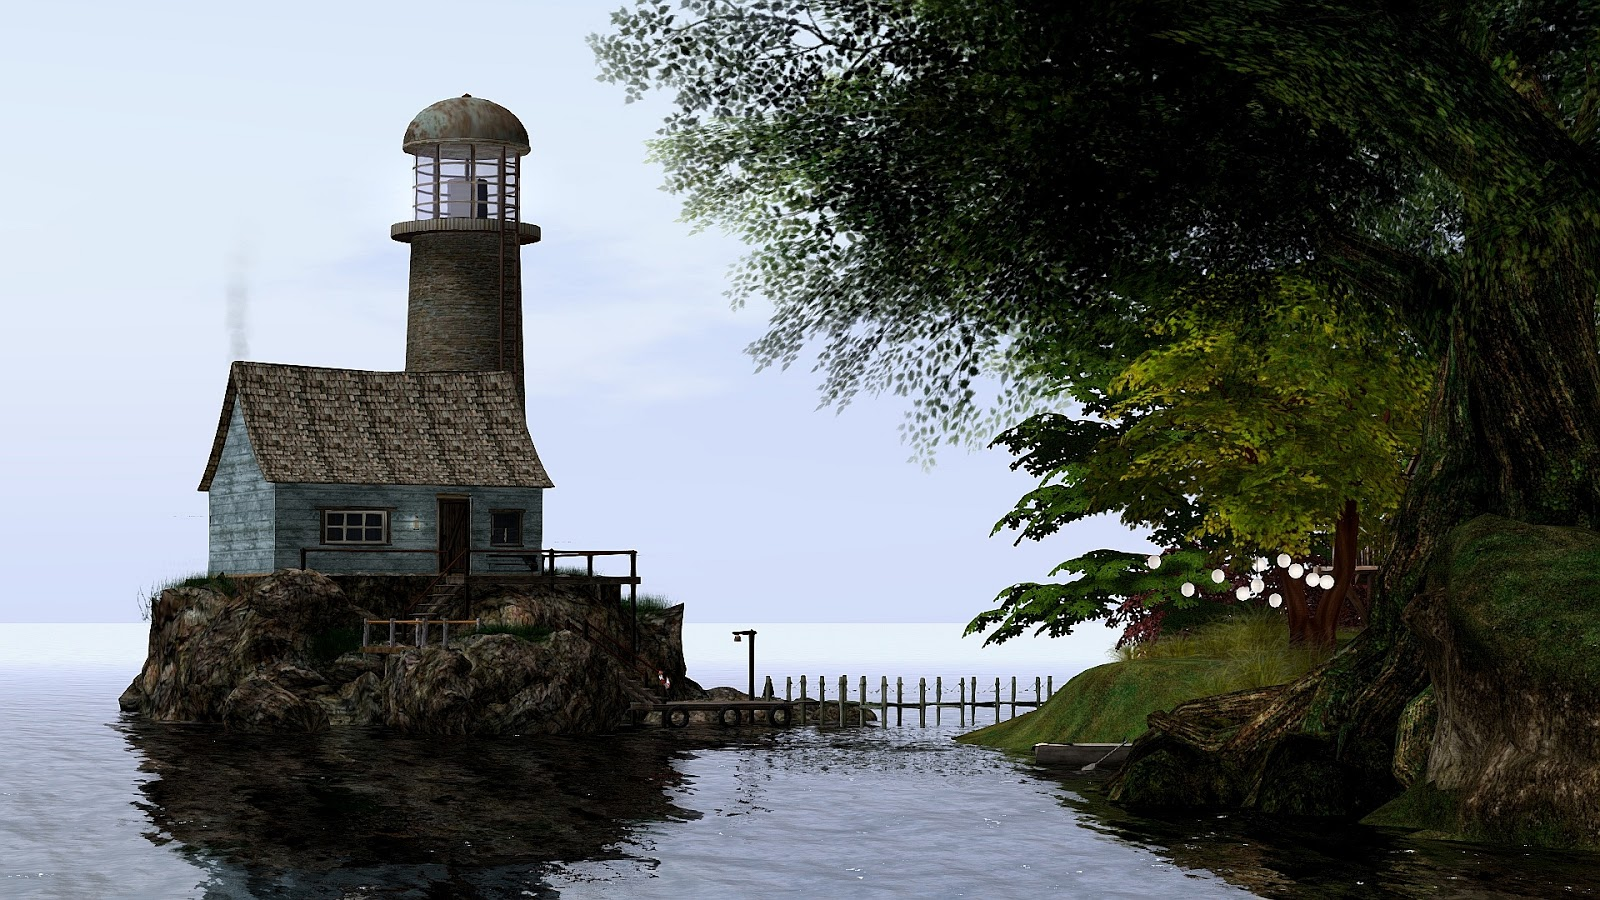 Echt virtuell simtipp rustic retreat for Rustic retreat